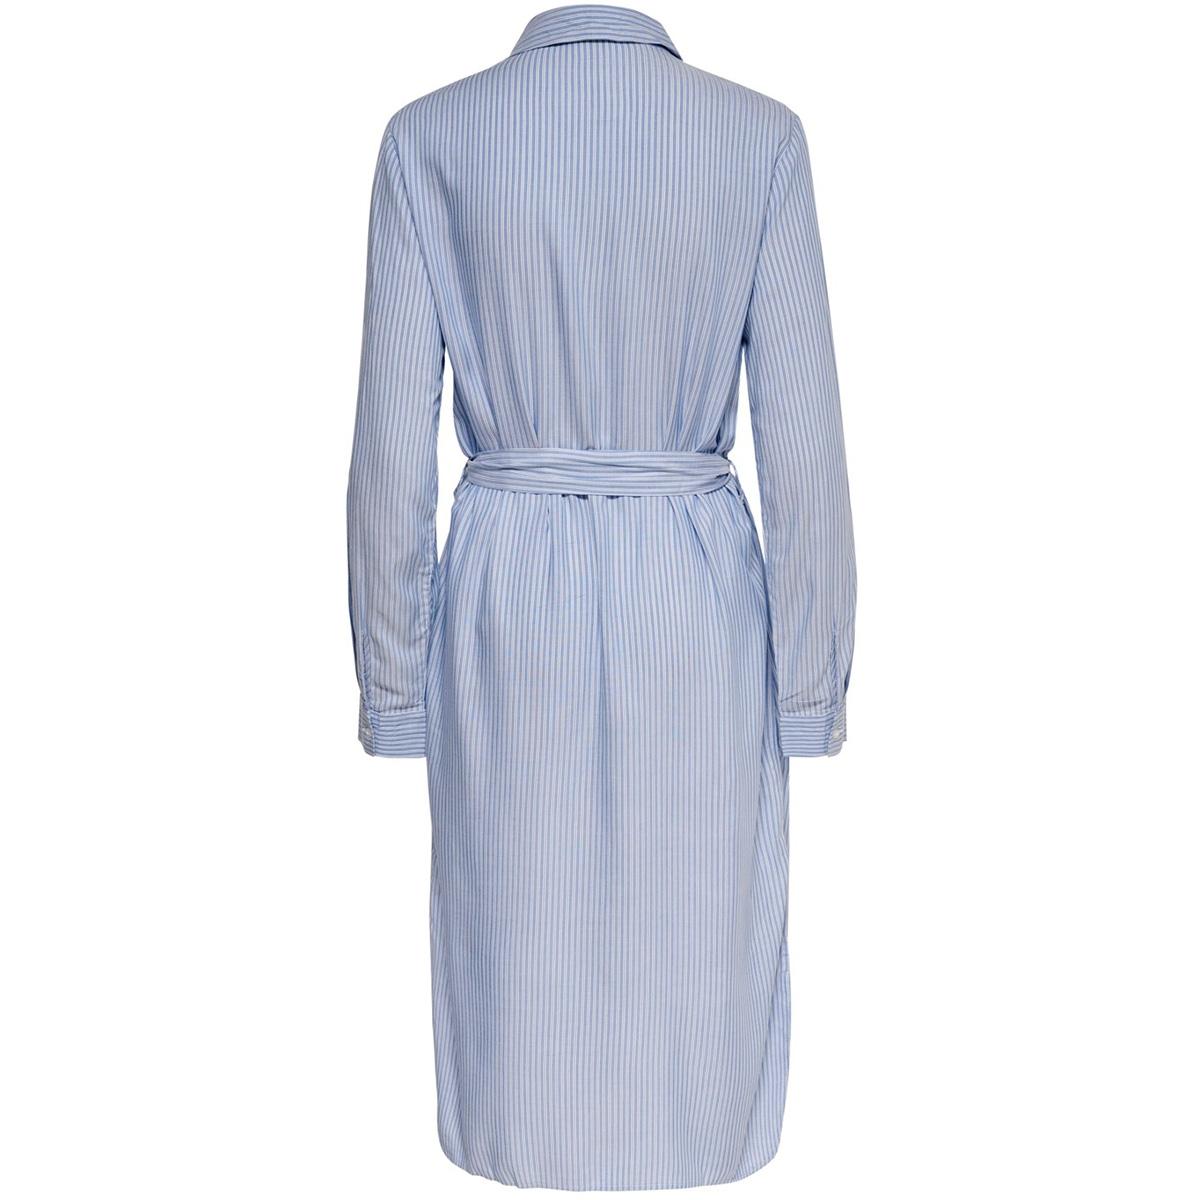 jdytom l/s shirt dress wvn 15204671 jacqueline de yong jurk chambray blue/bright white